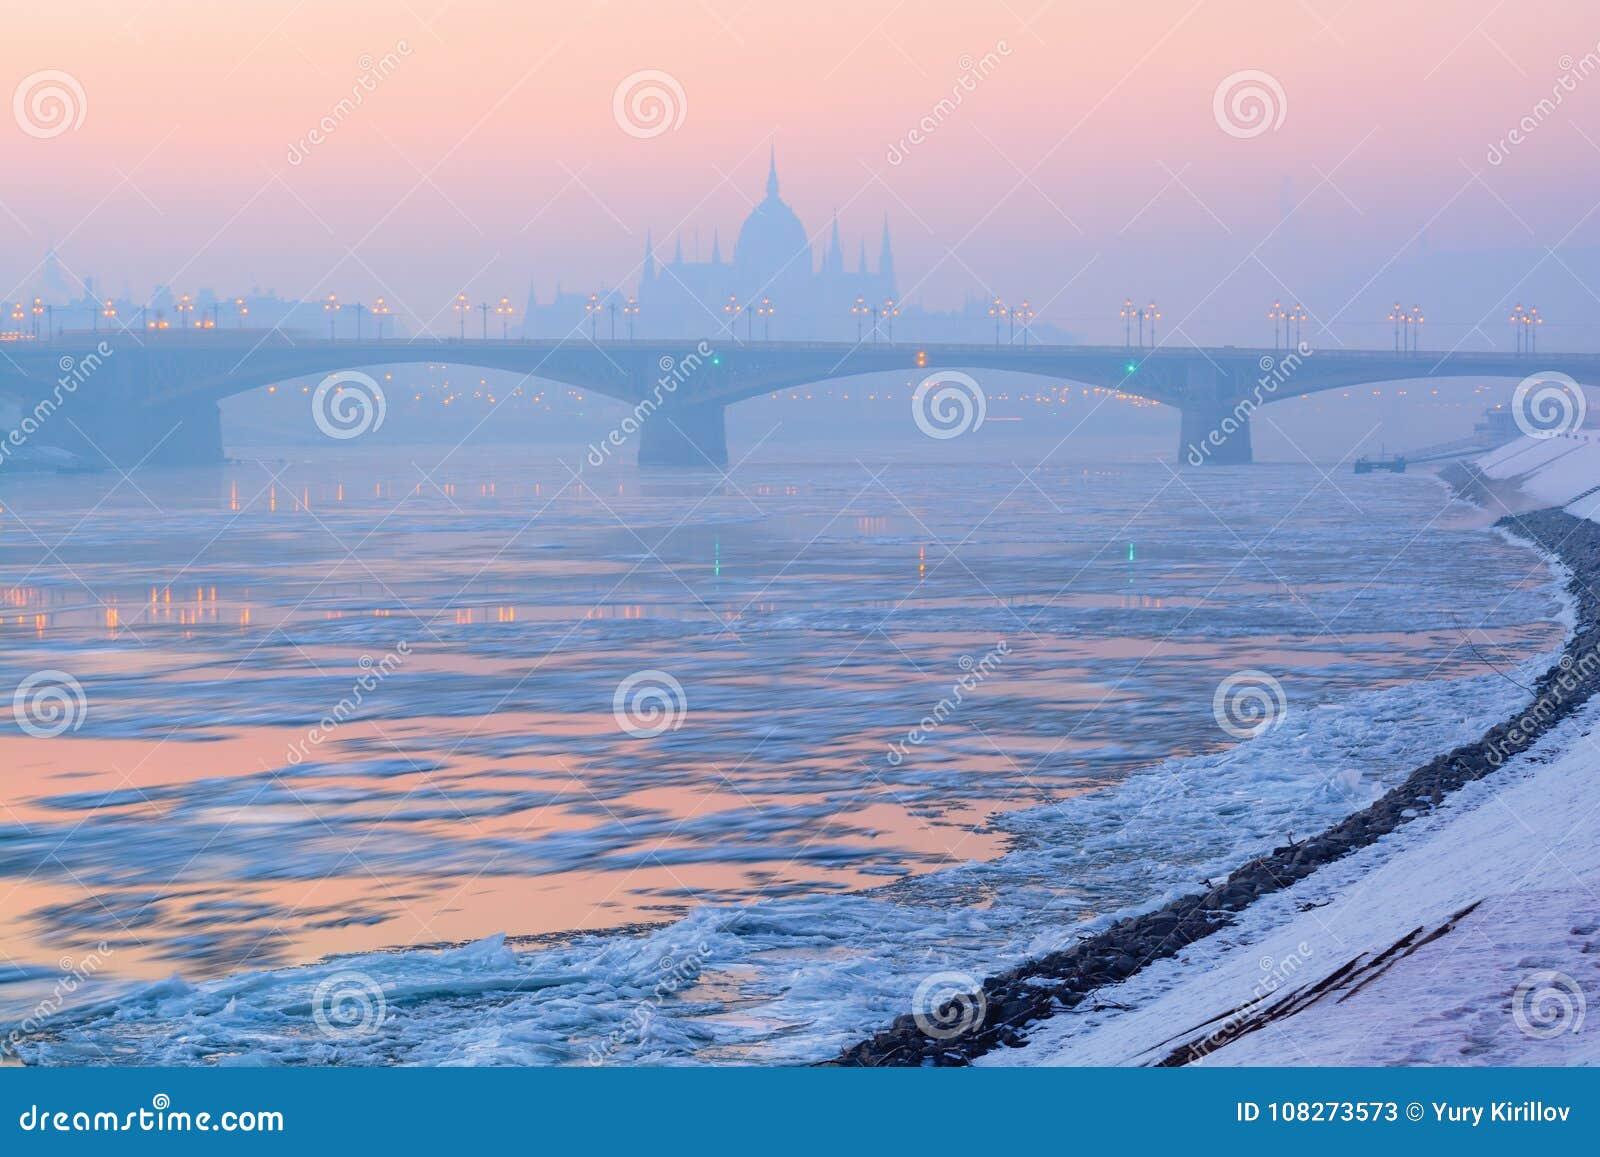 Fluss, Schollen, Margaret-Brücke, Parlament umreißen im Winter, Budapest